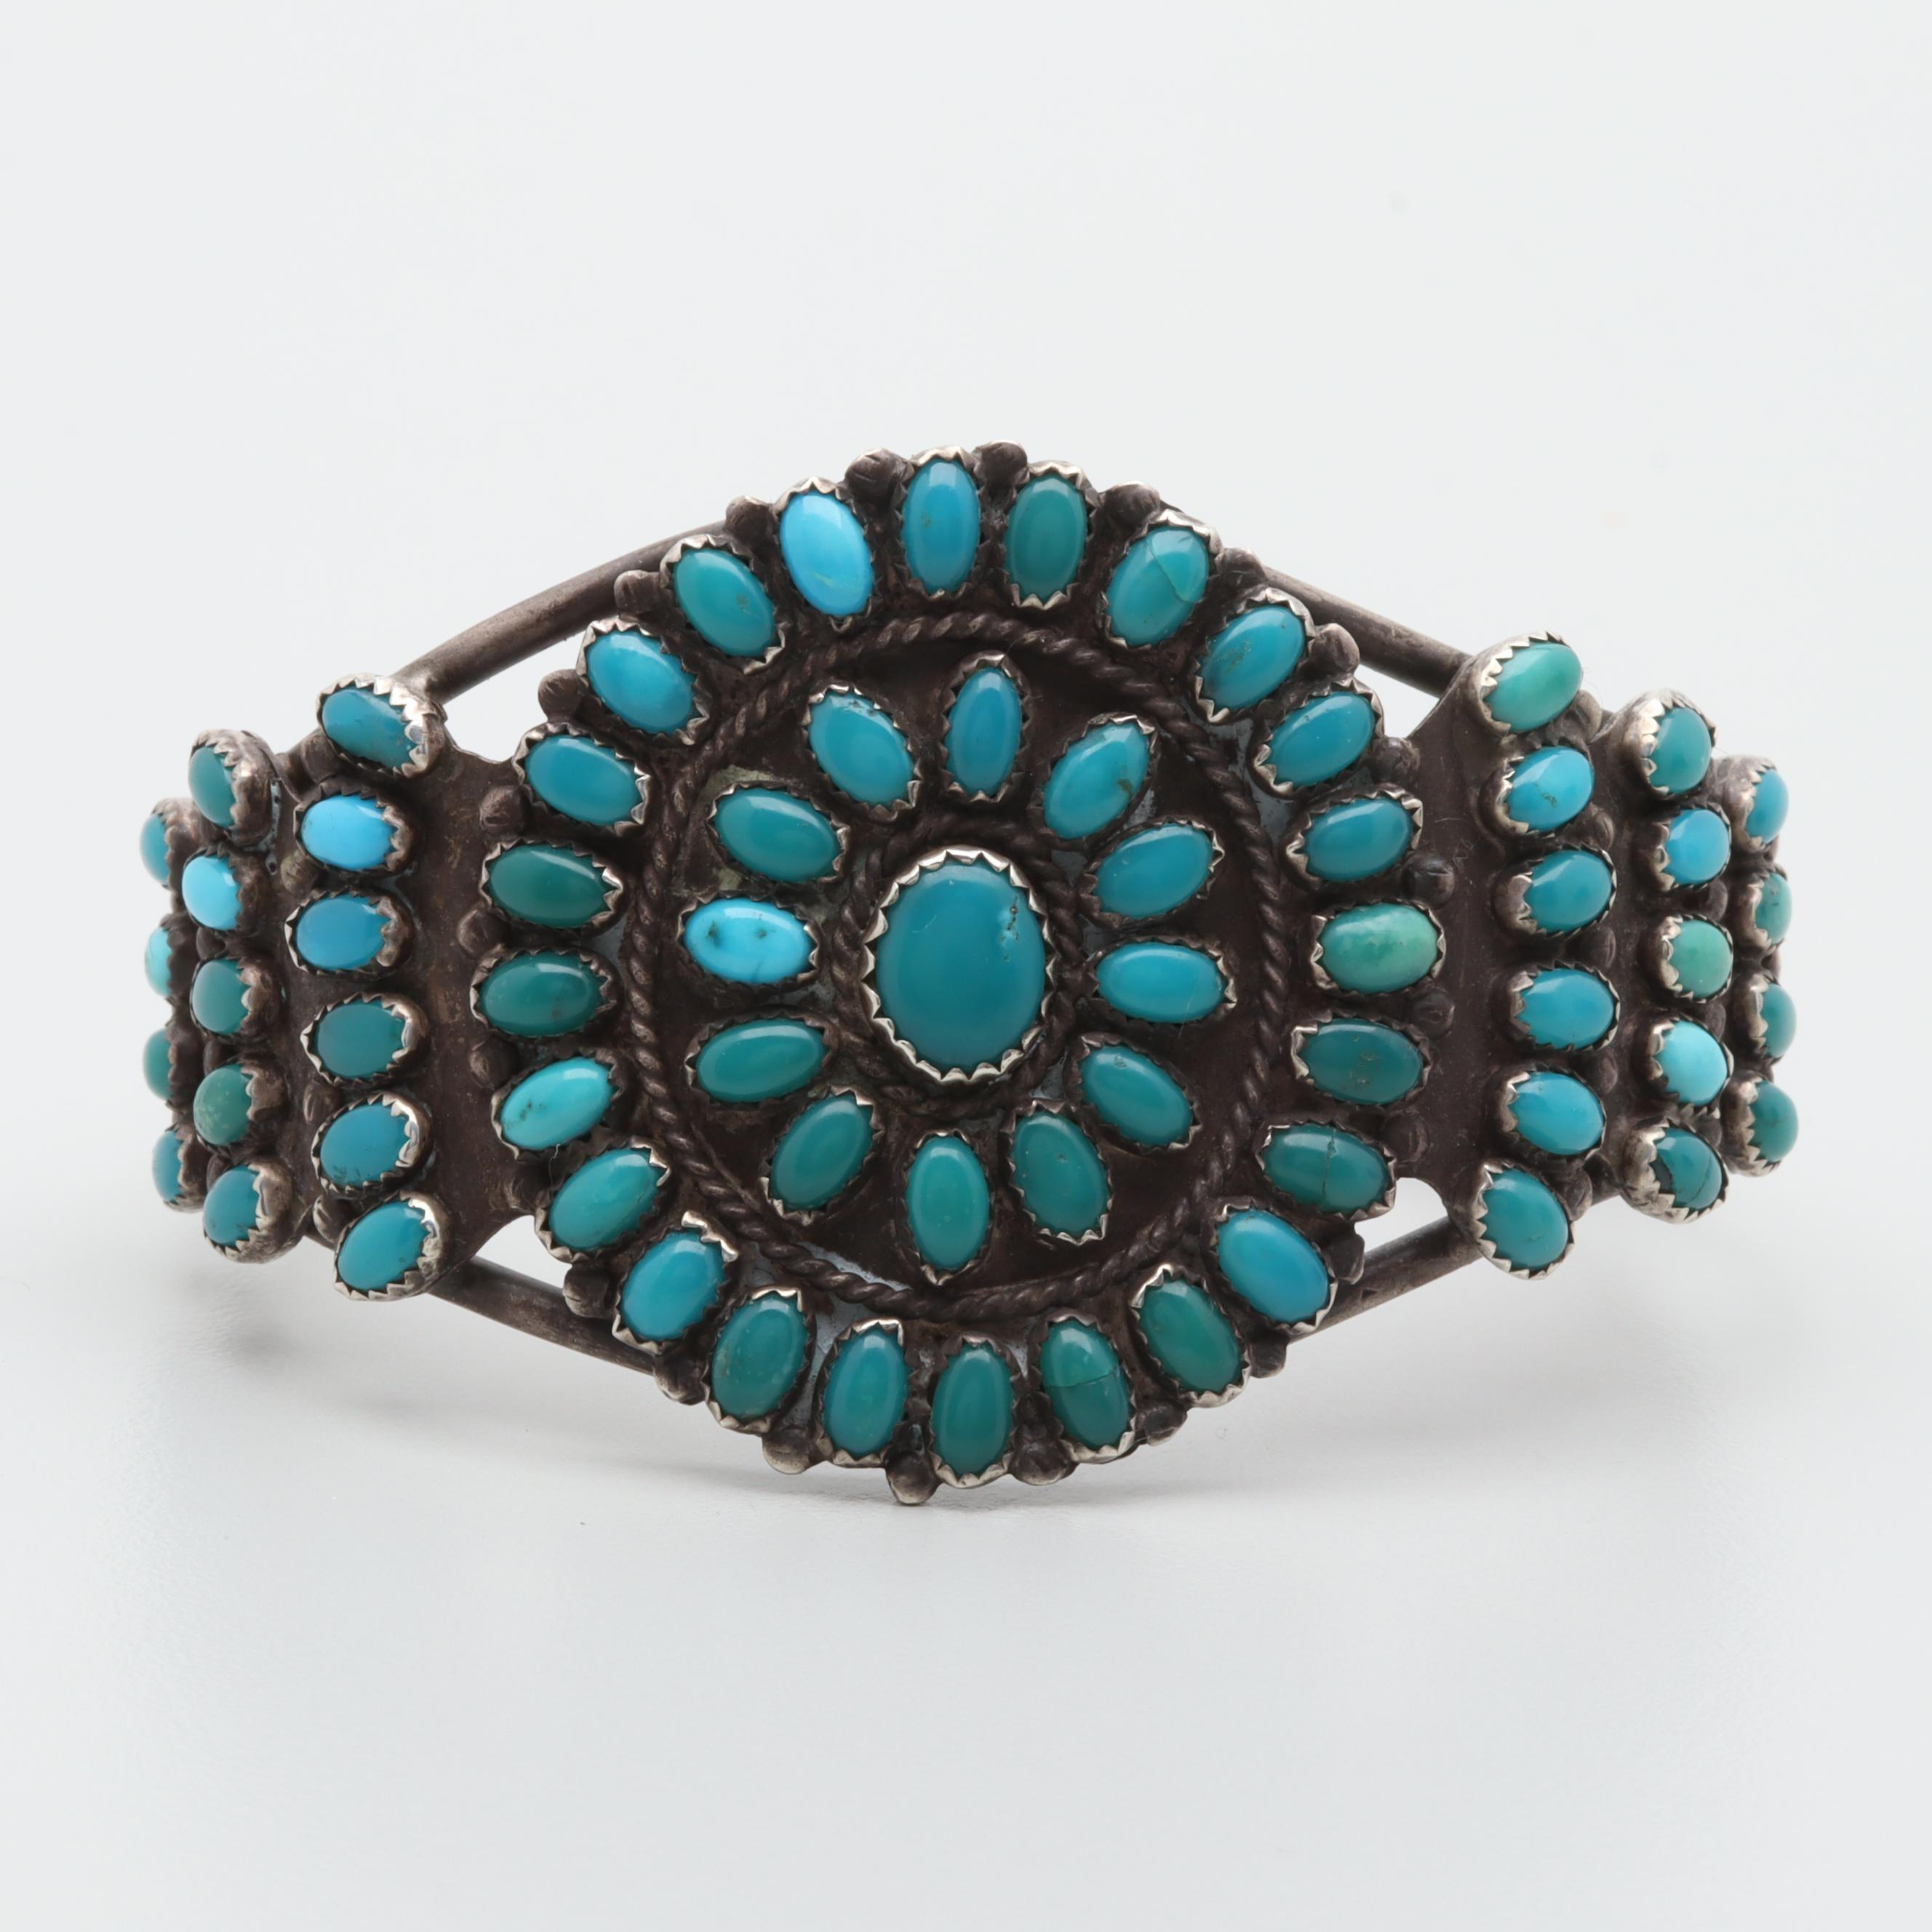 Judy Wallace Zuni Sterling Silver Turquoise Cuff